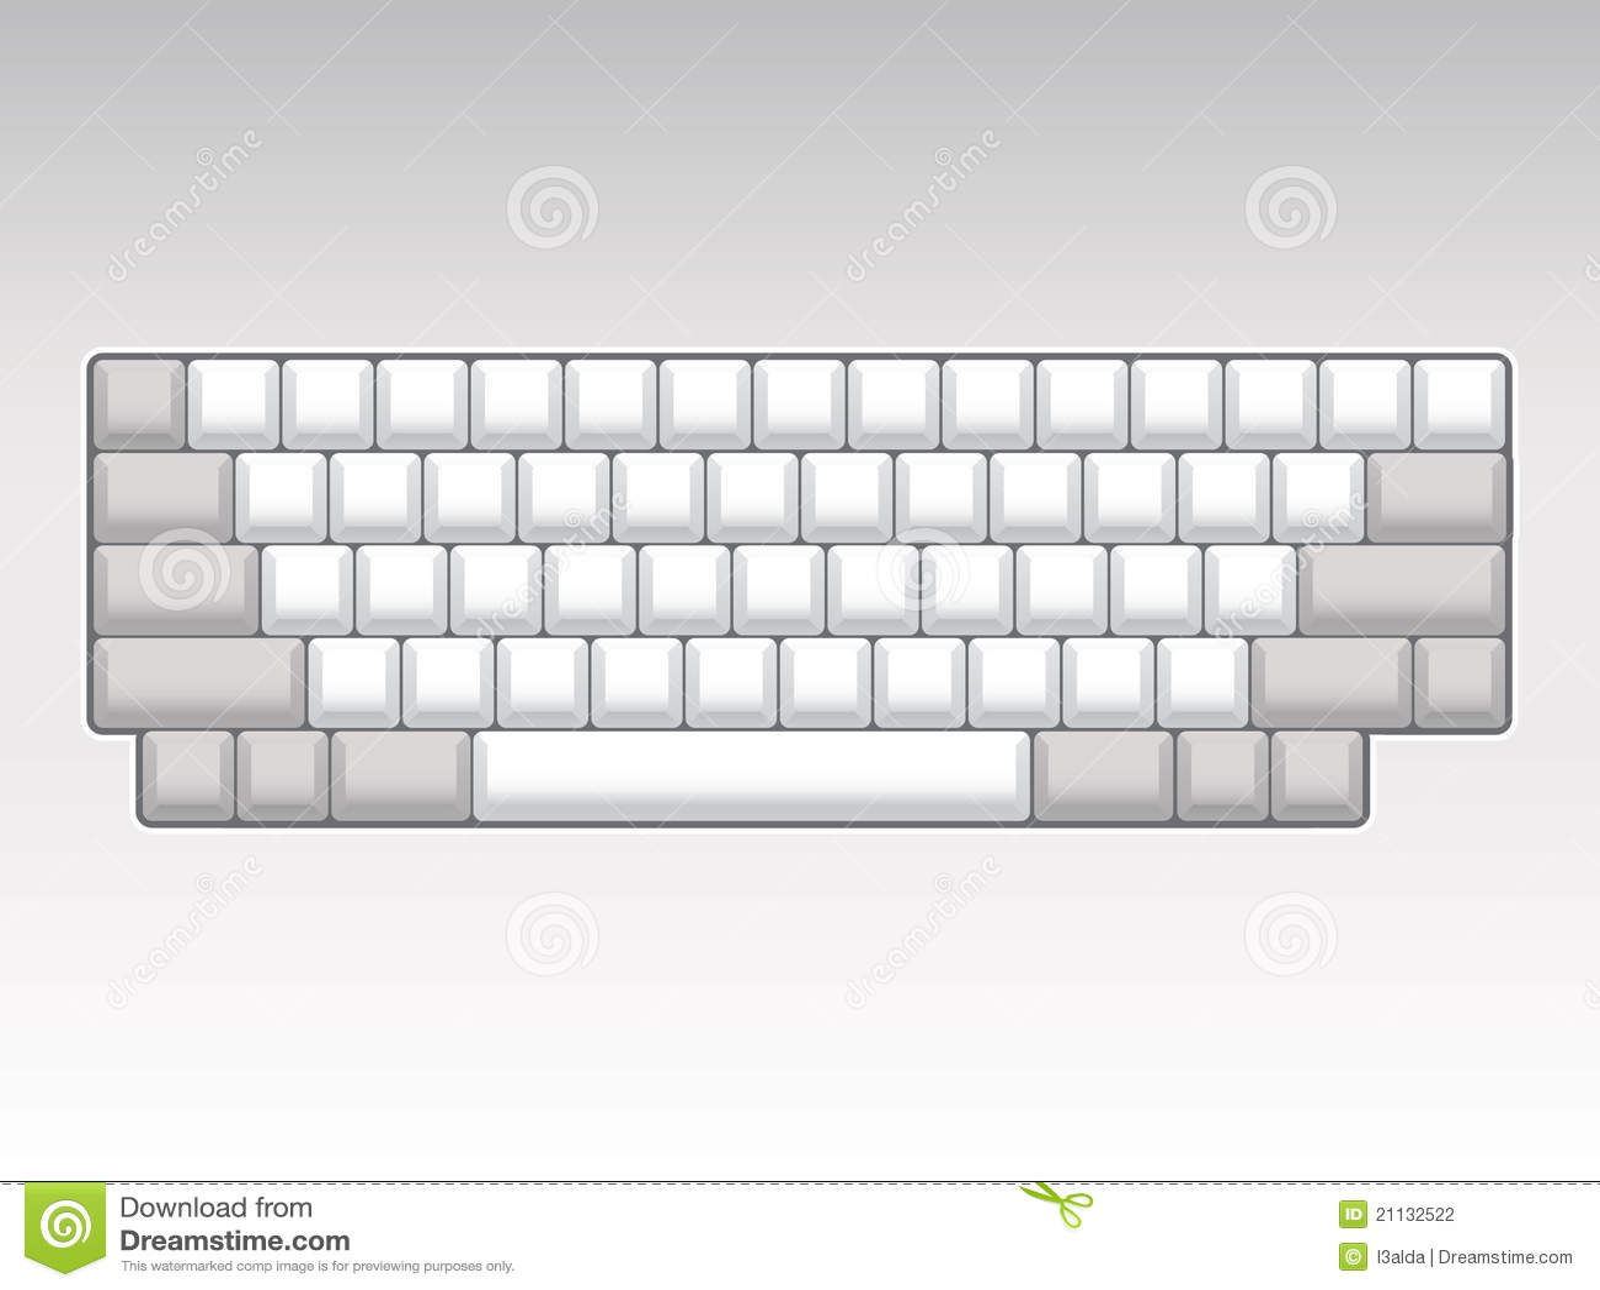 Blank Keyboard Layout Stock Photography